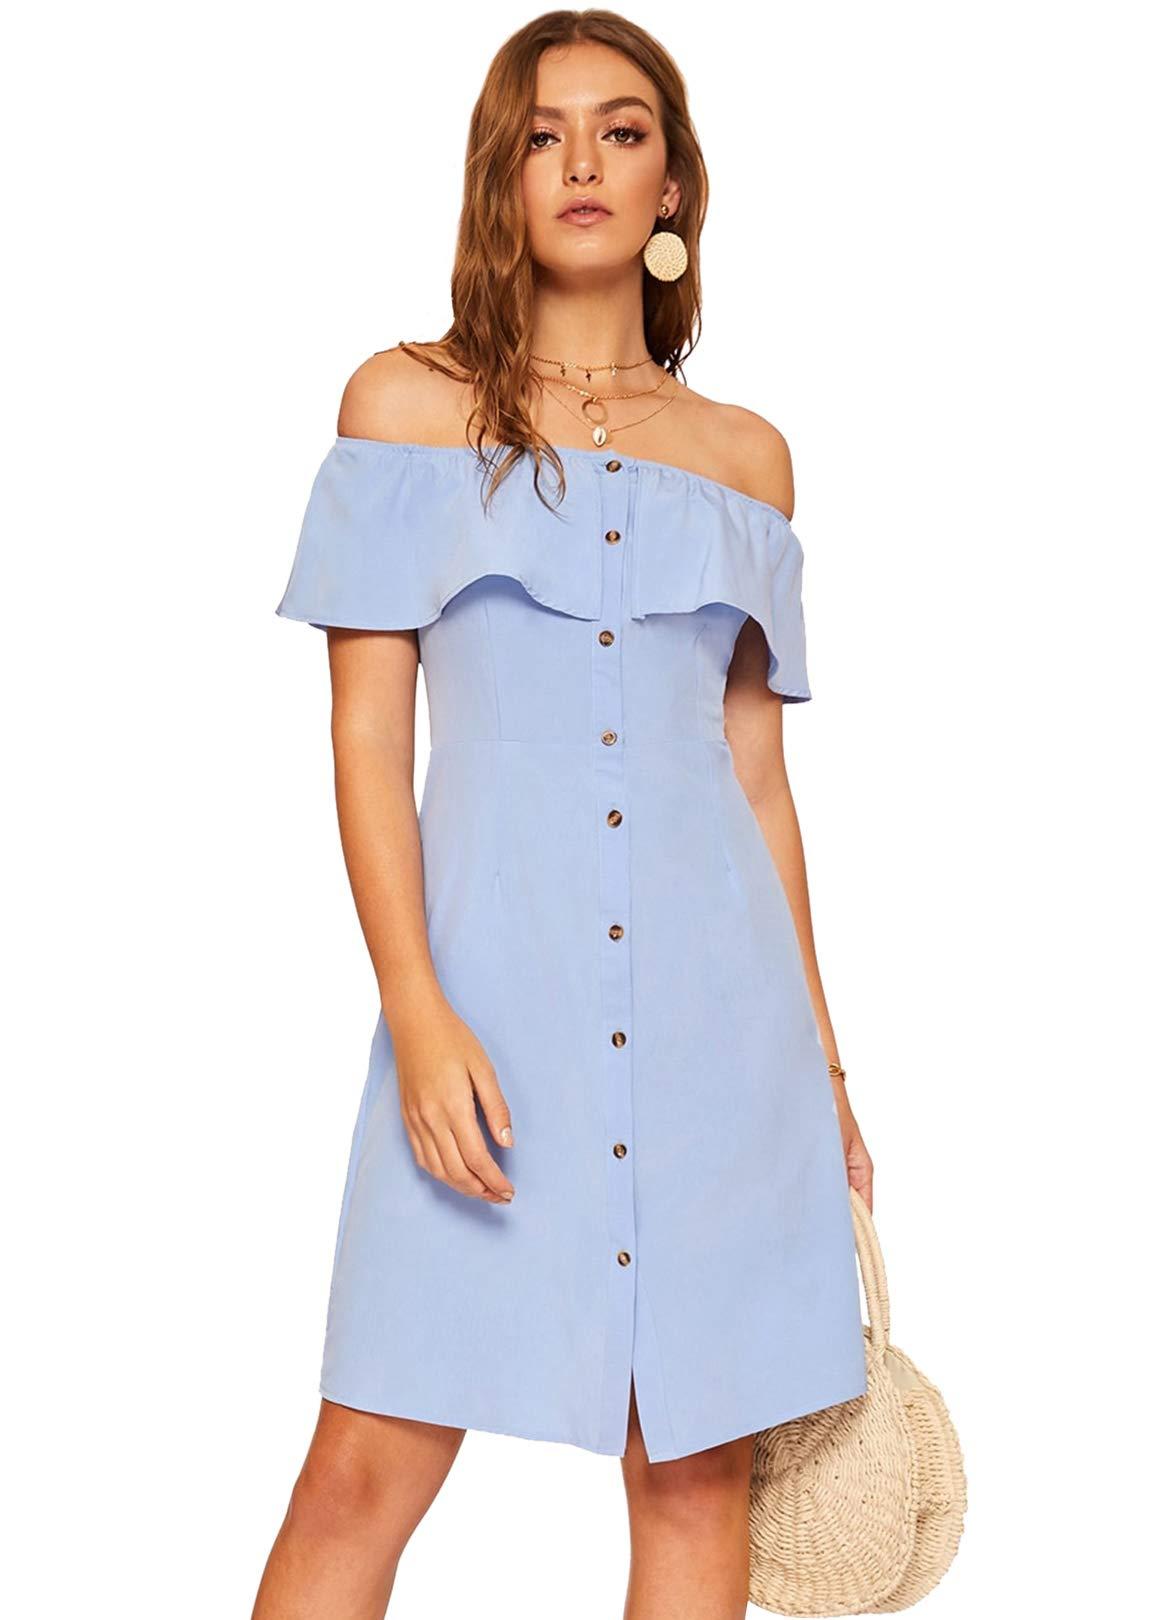 Available at Amazon: Milumia Women's Off The Shoulder Button Up Summer Flounce Trim Denim Dress